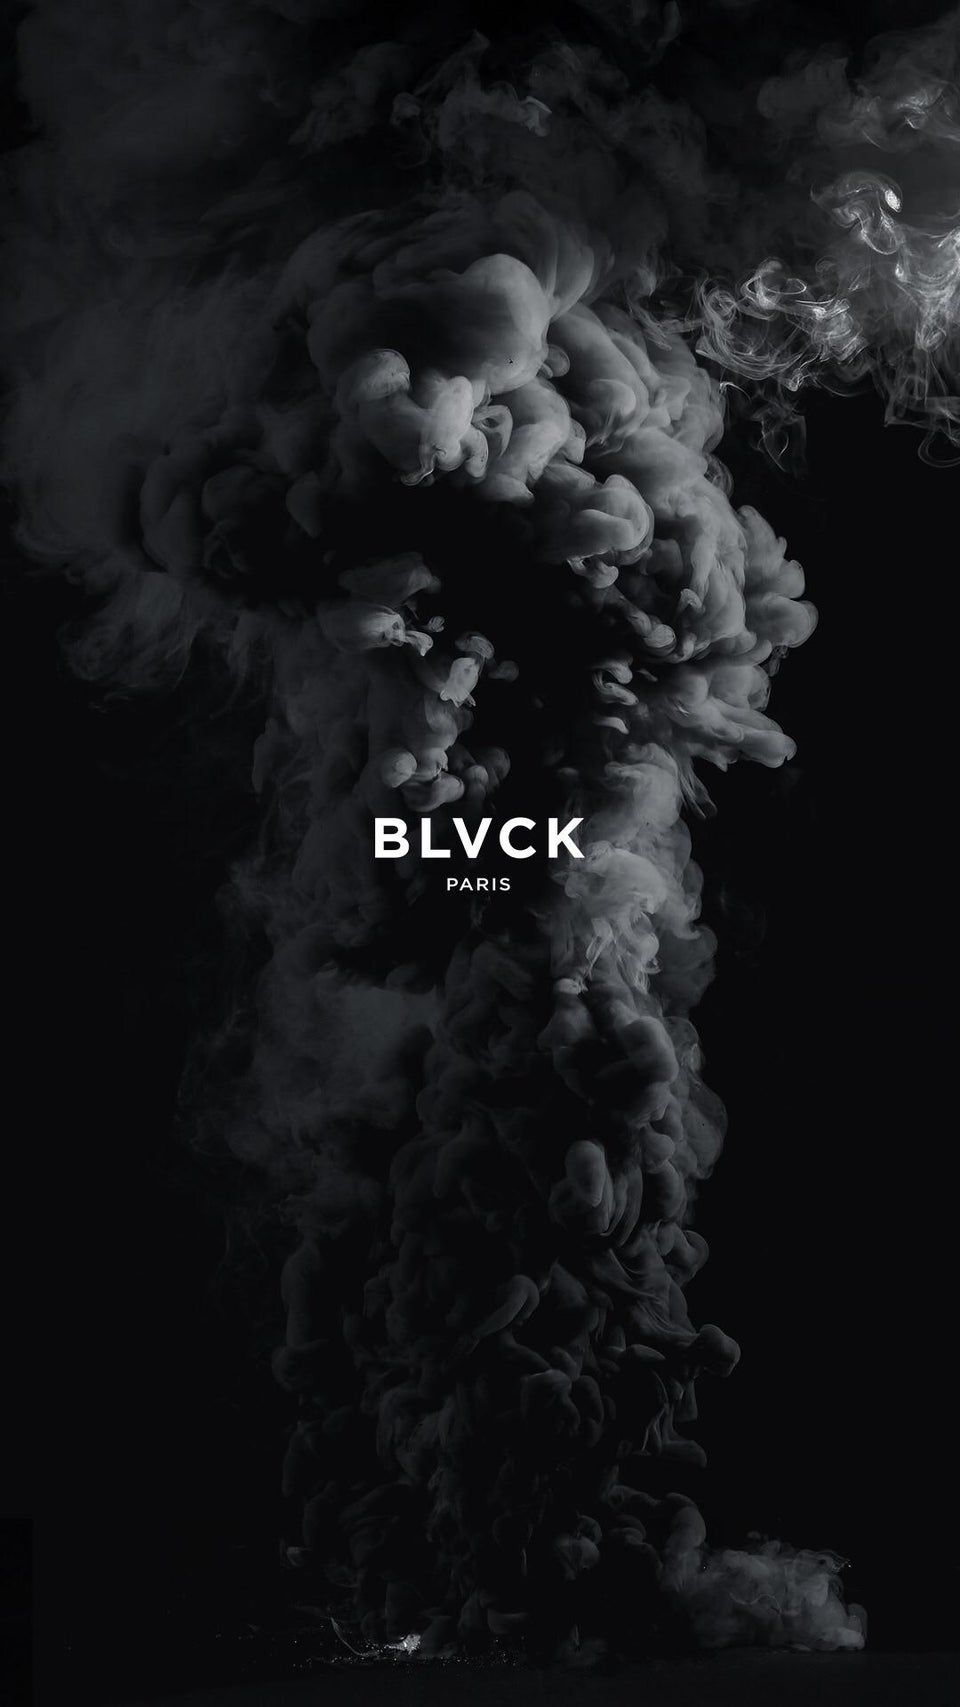 Reddit - iWallpaper - Blvck